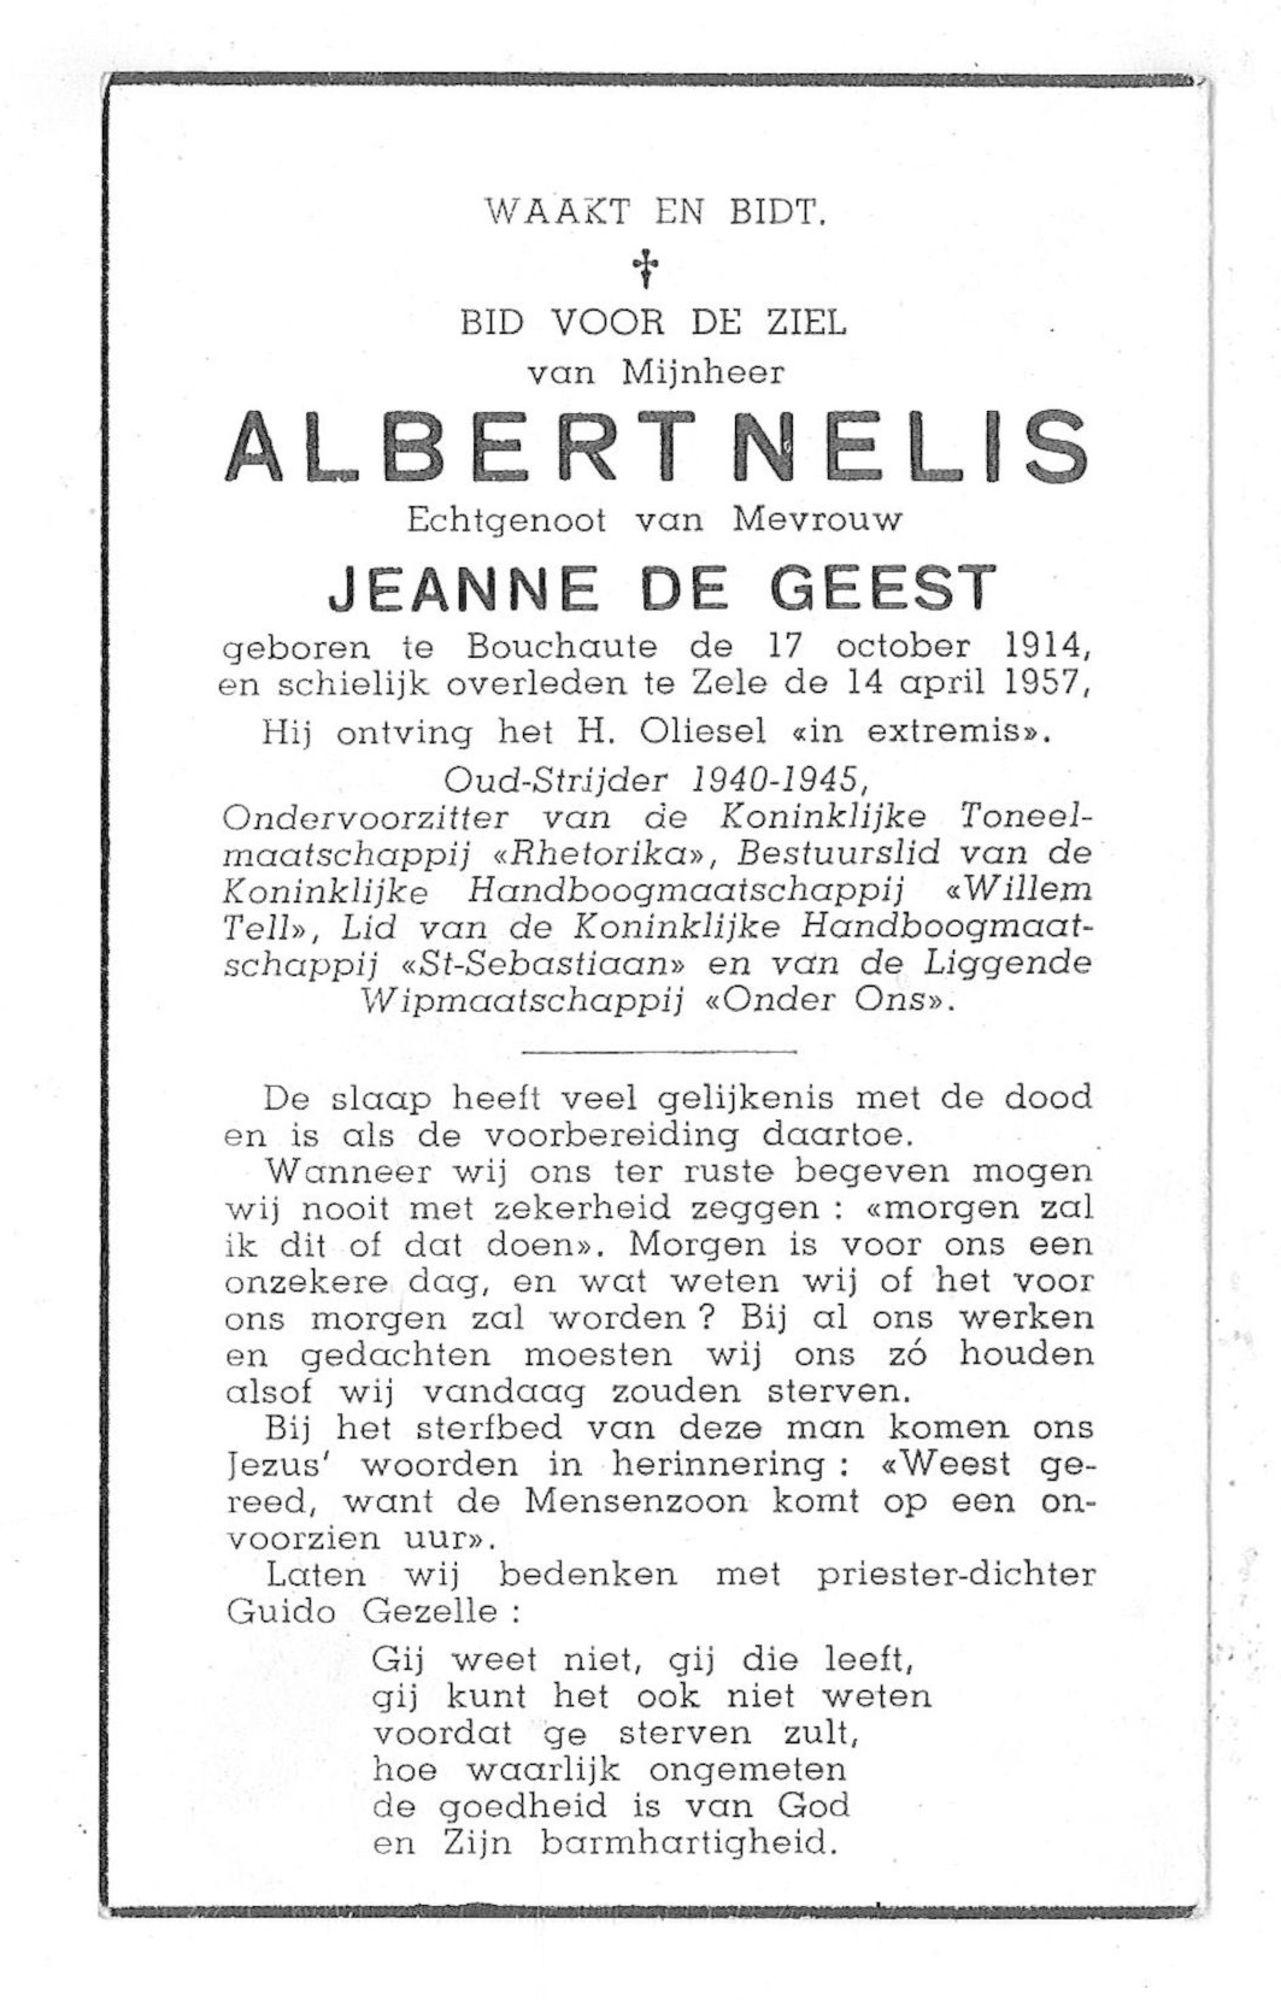 Albert Nelis